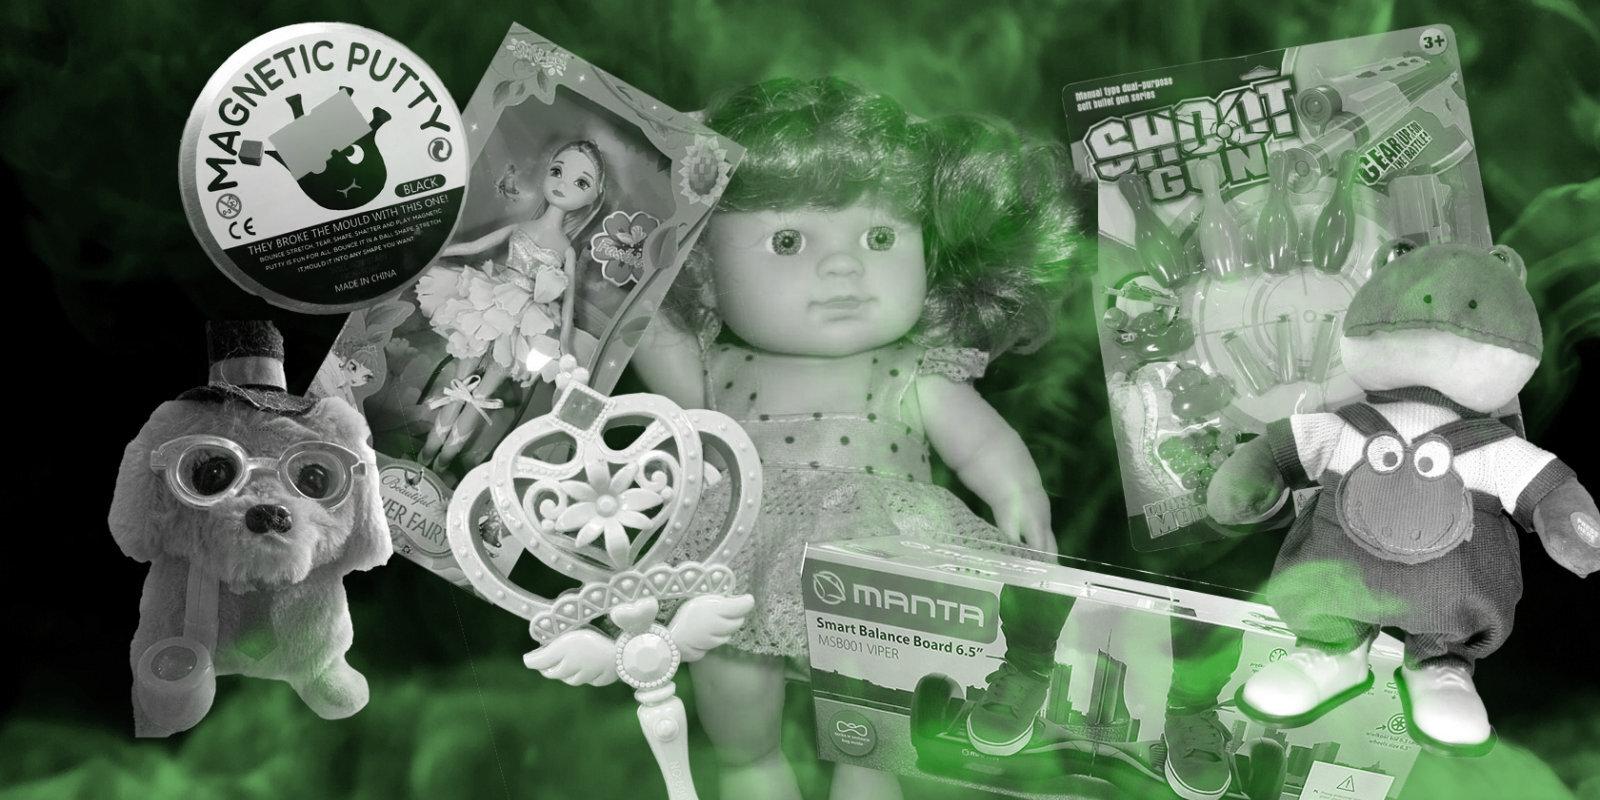 токсичные игрушки